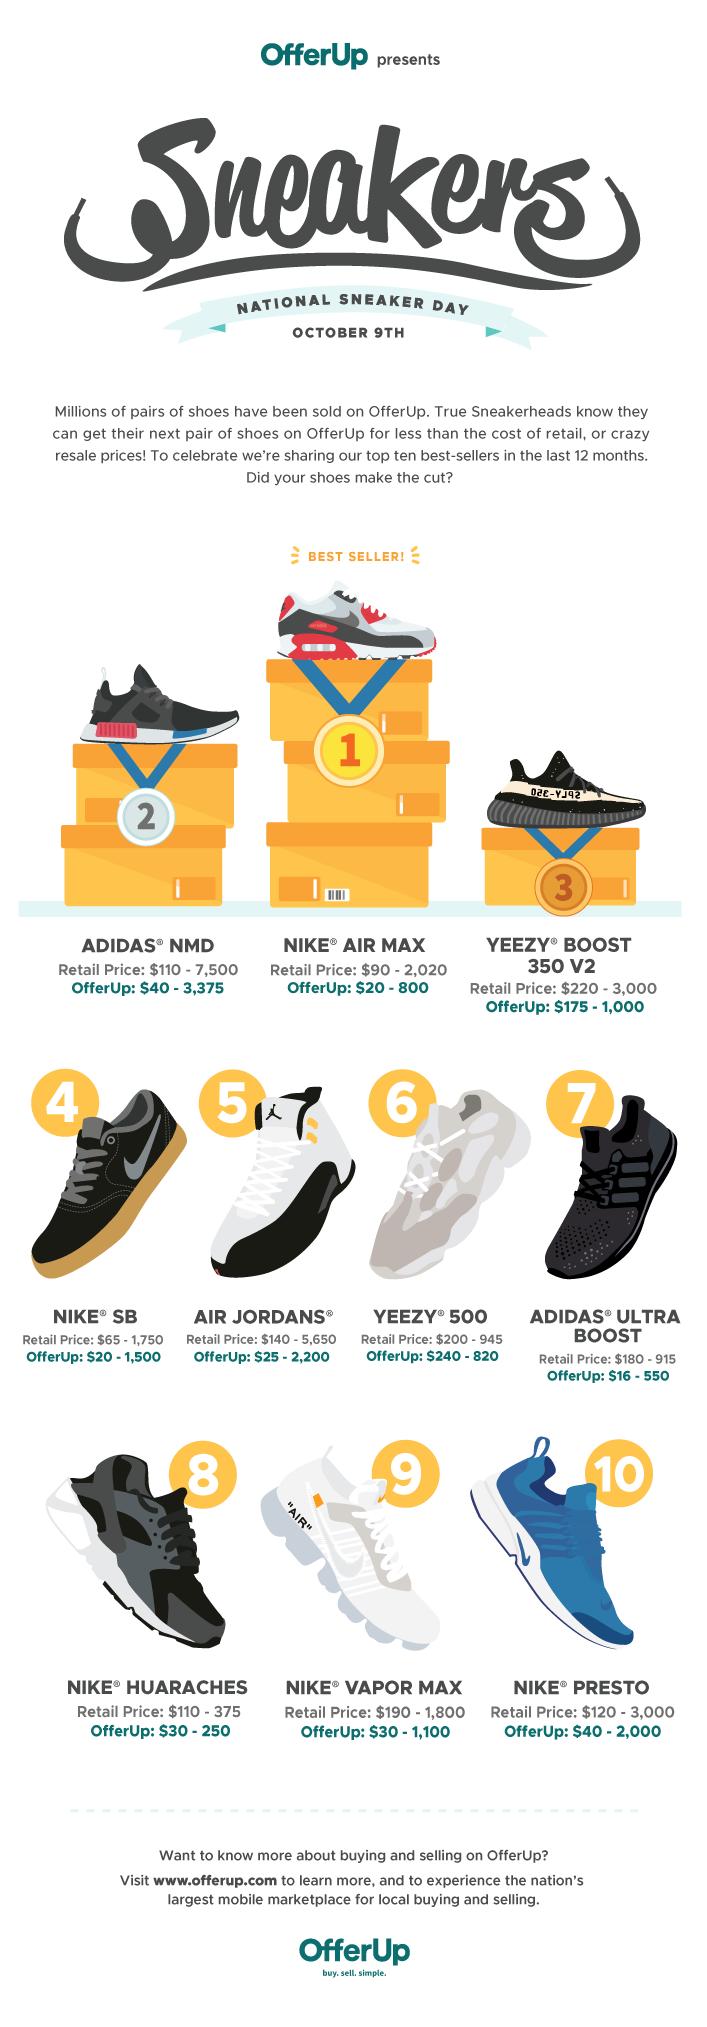 OU_PR-Sneakers_707x2027px_SHORT.png